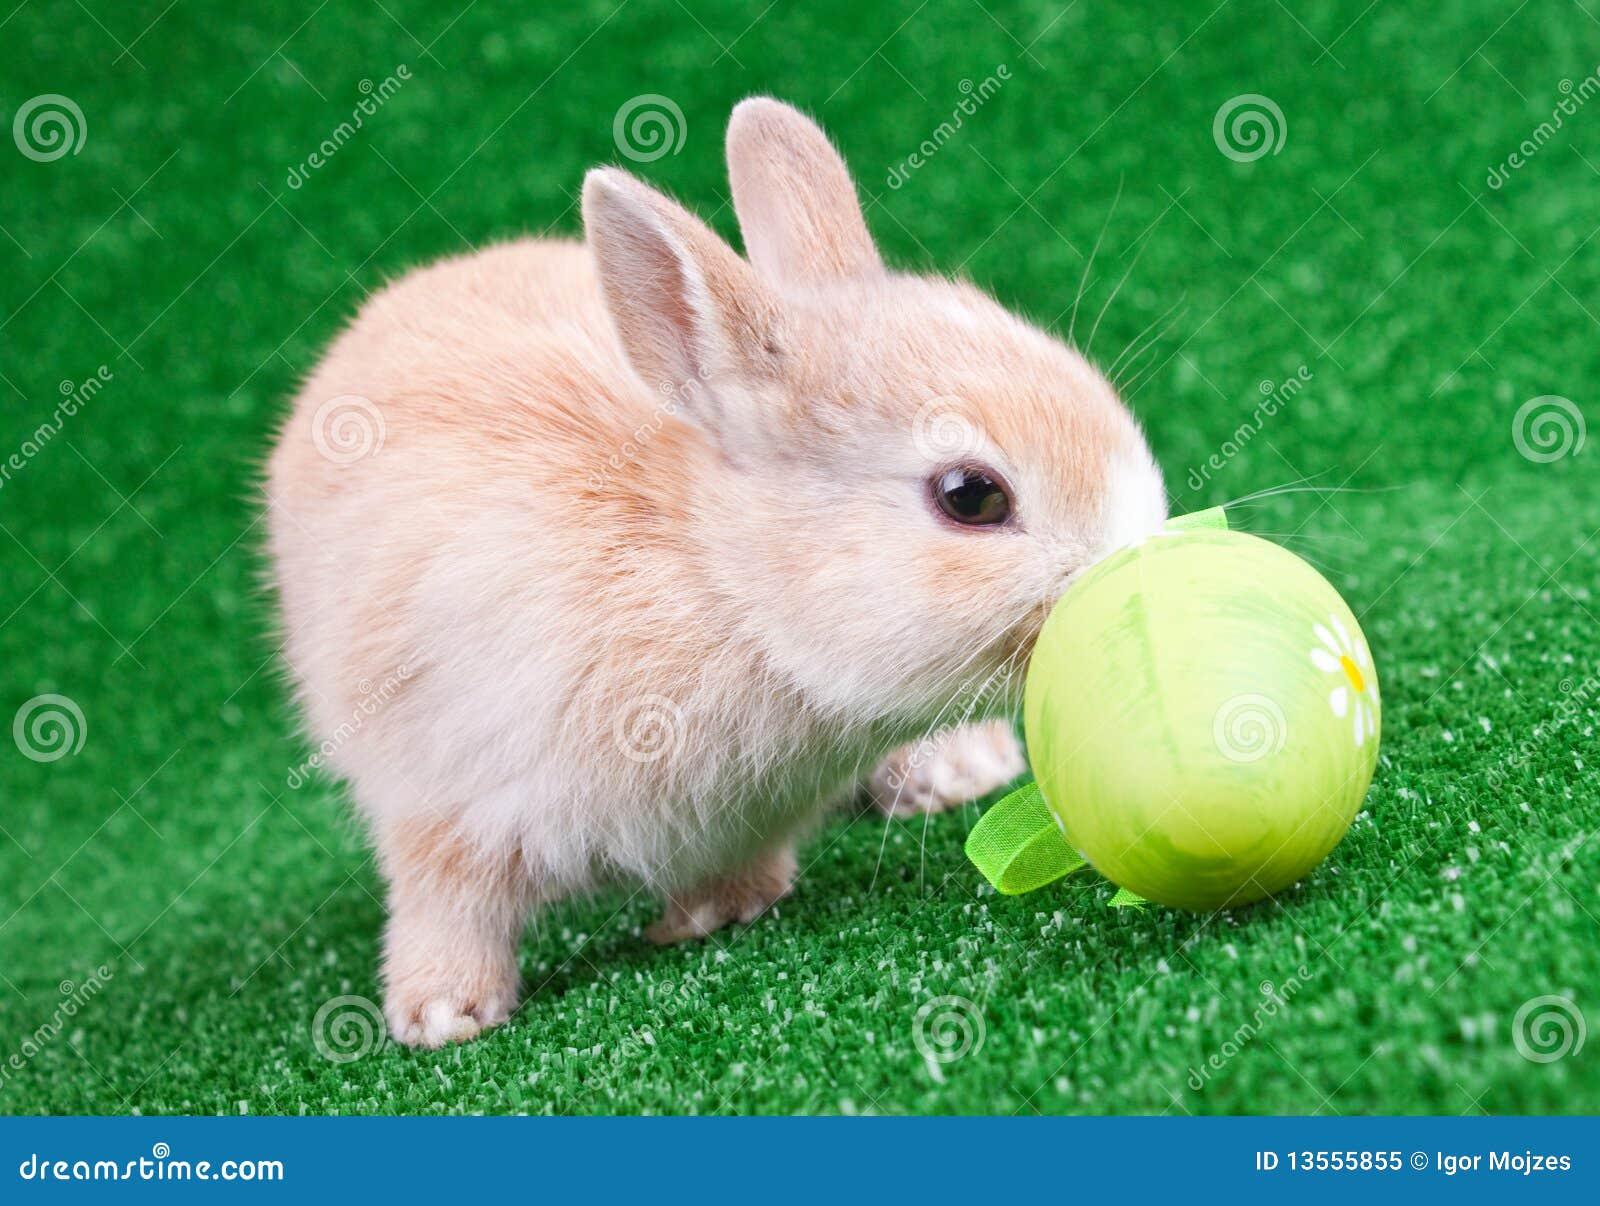 bunny rabbit sniffing around - photo #37